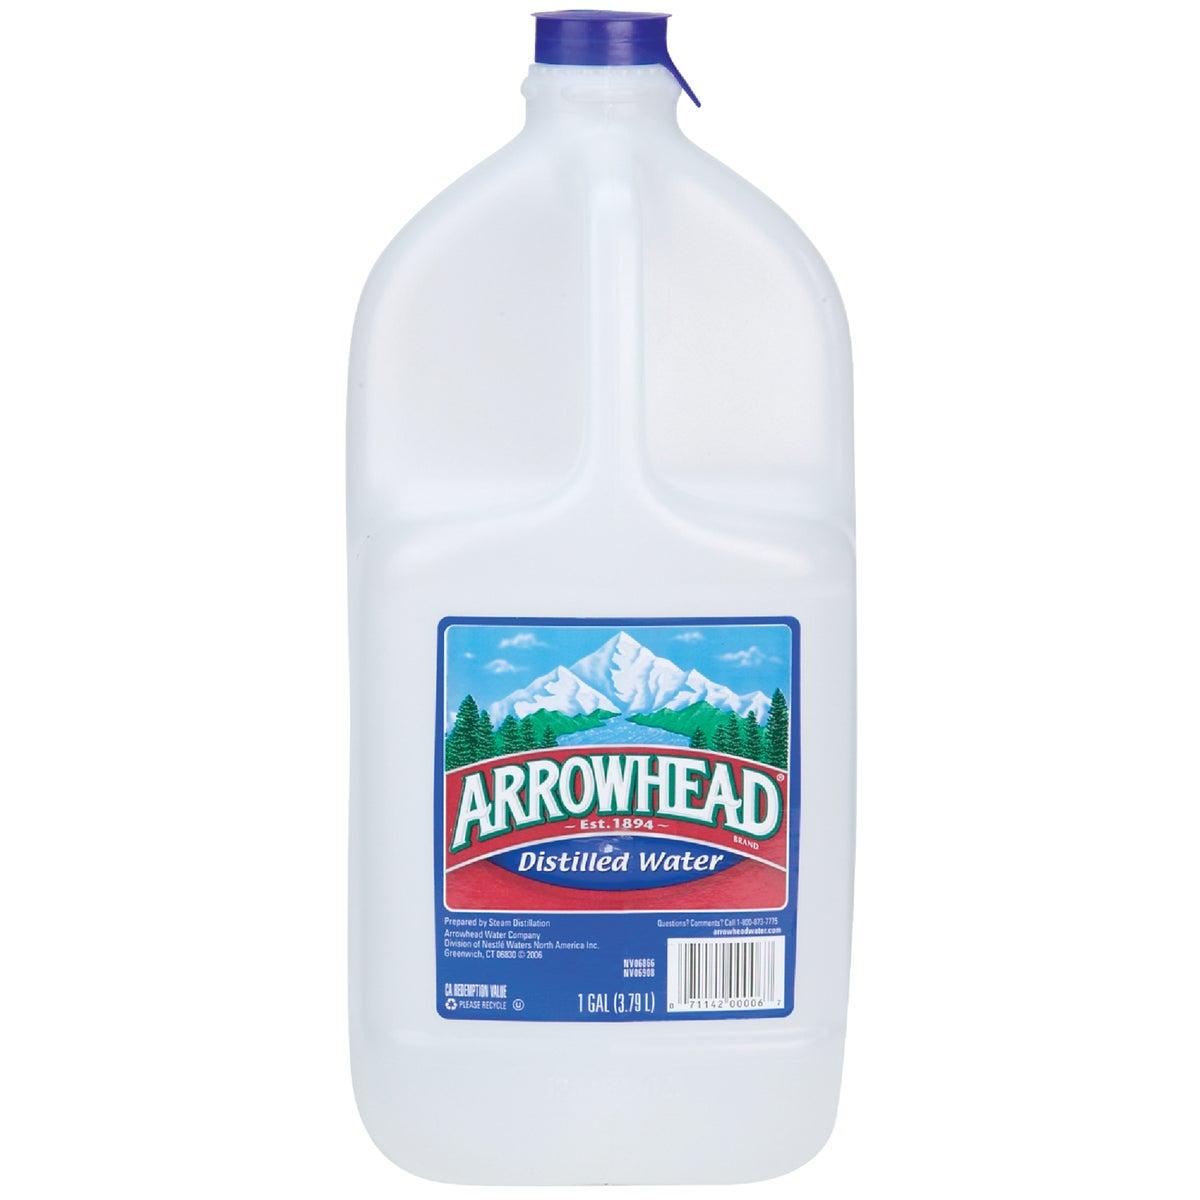 GAL ARROWHEAD DIST WATER